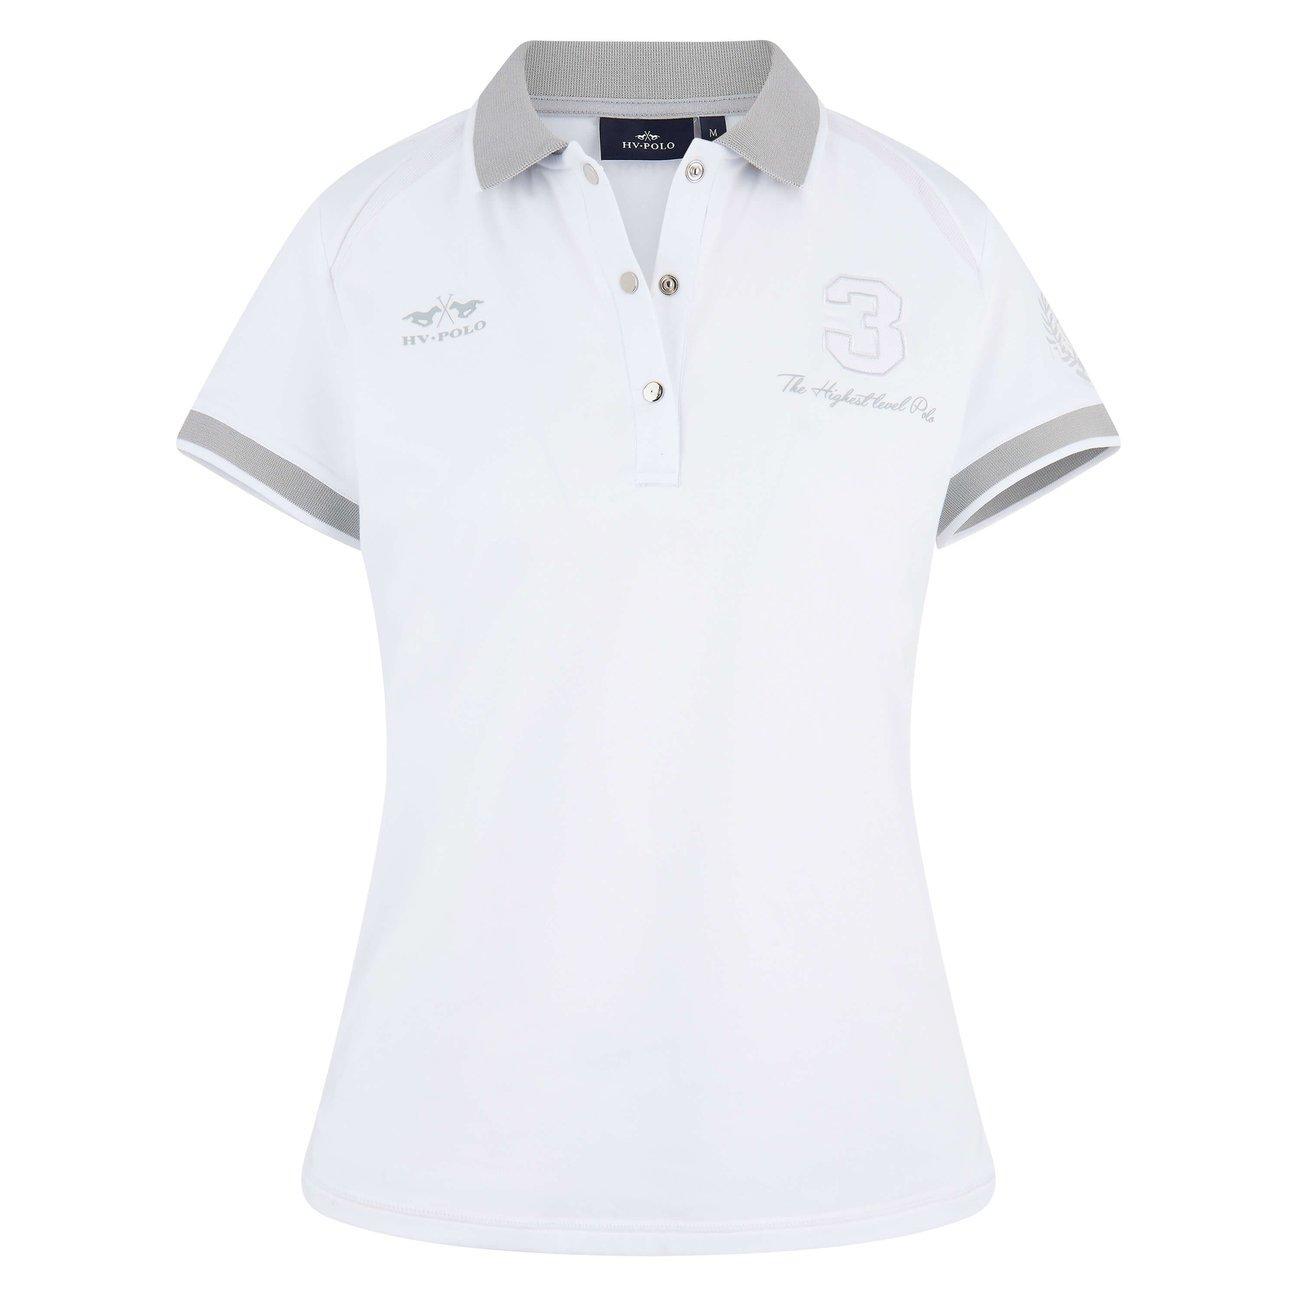 HV Polo Poloshirt Favouritas Tech weiss, Gr. 2 XL - white